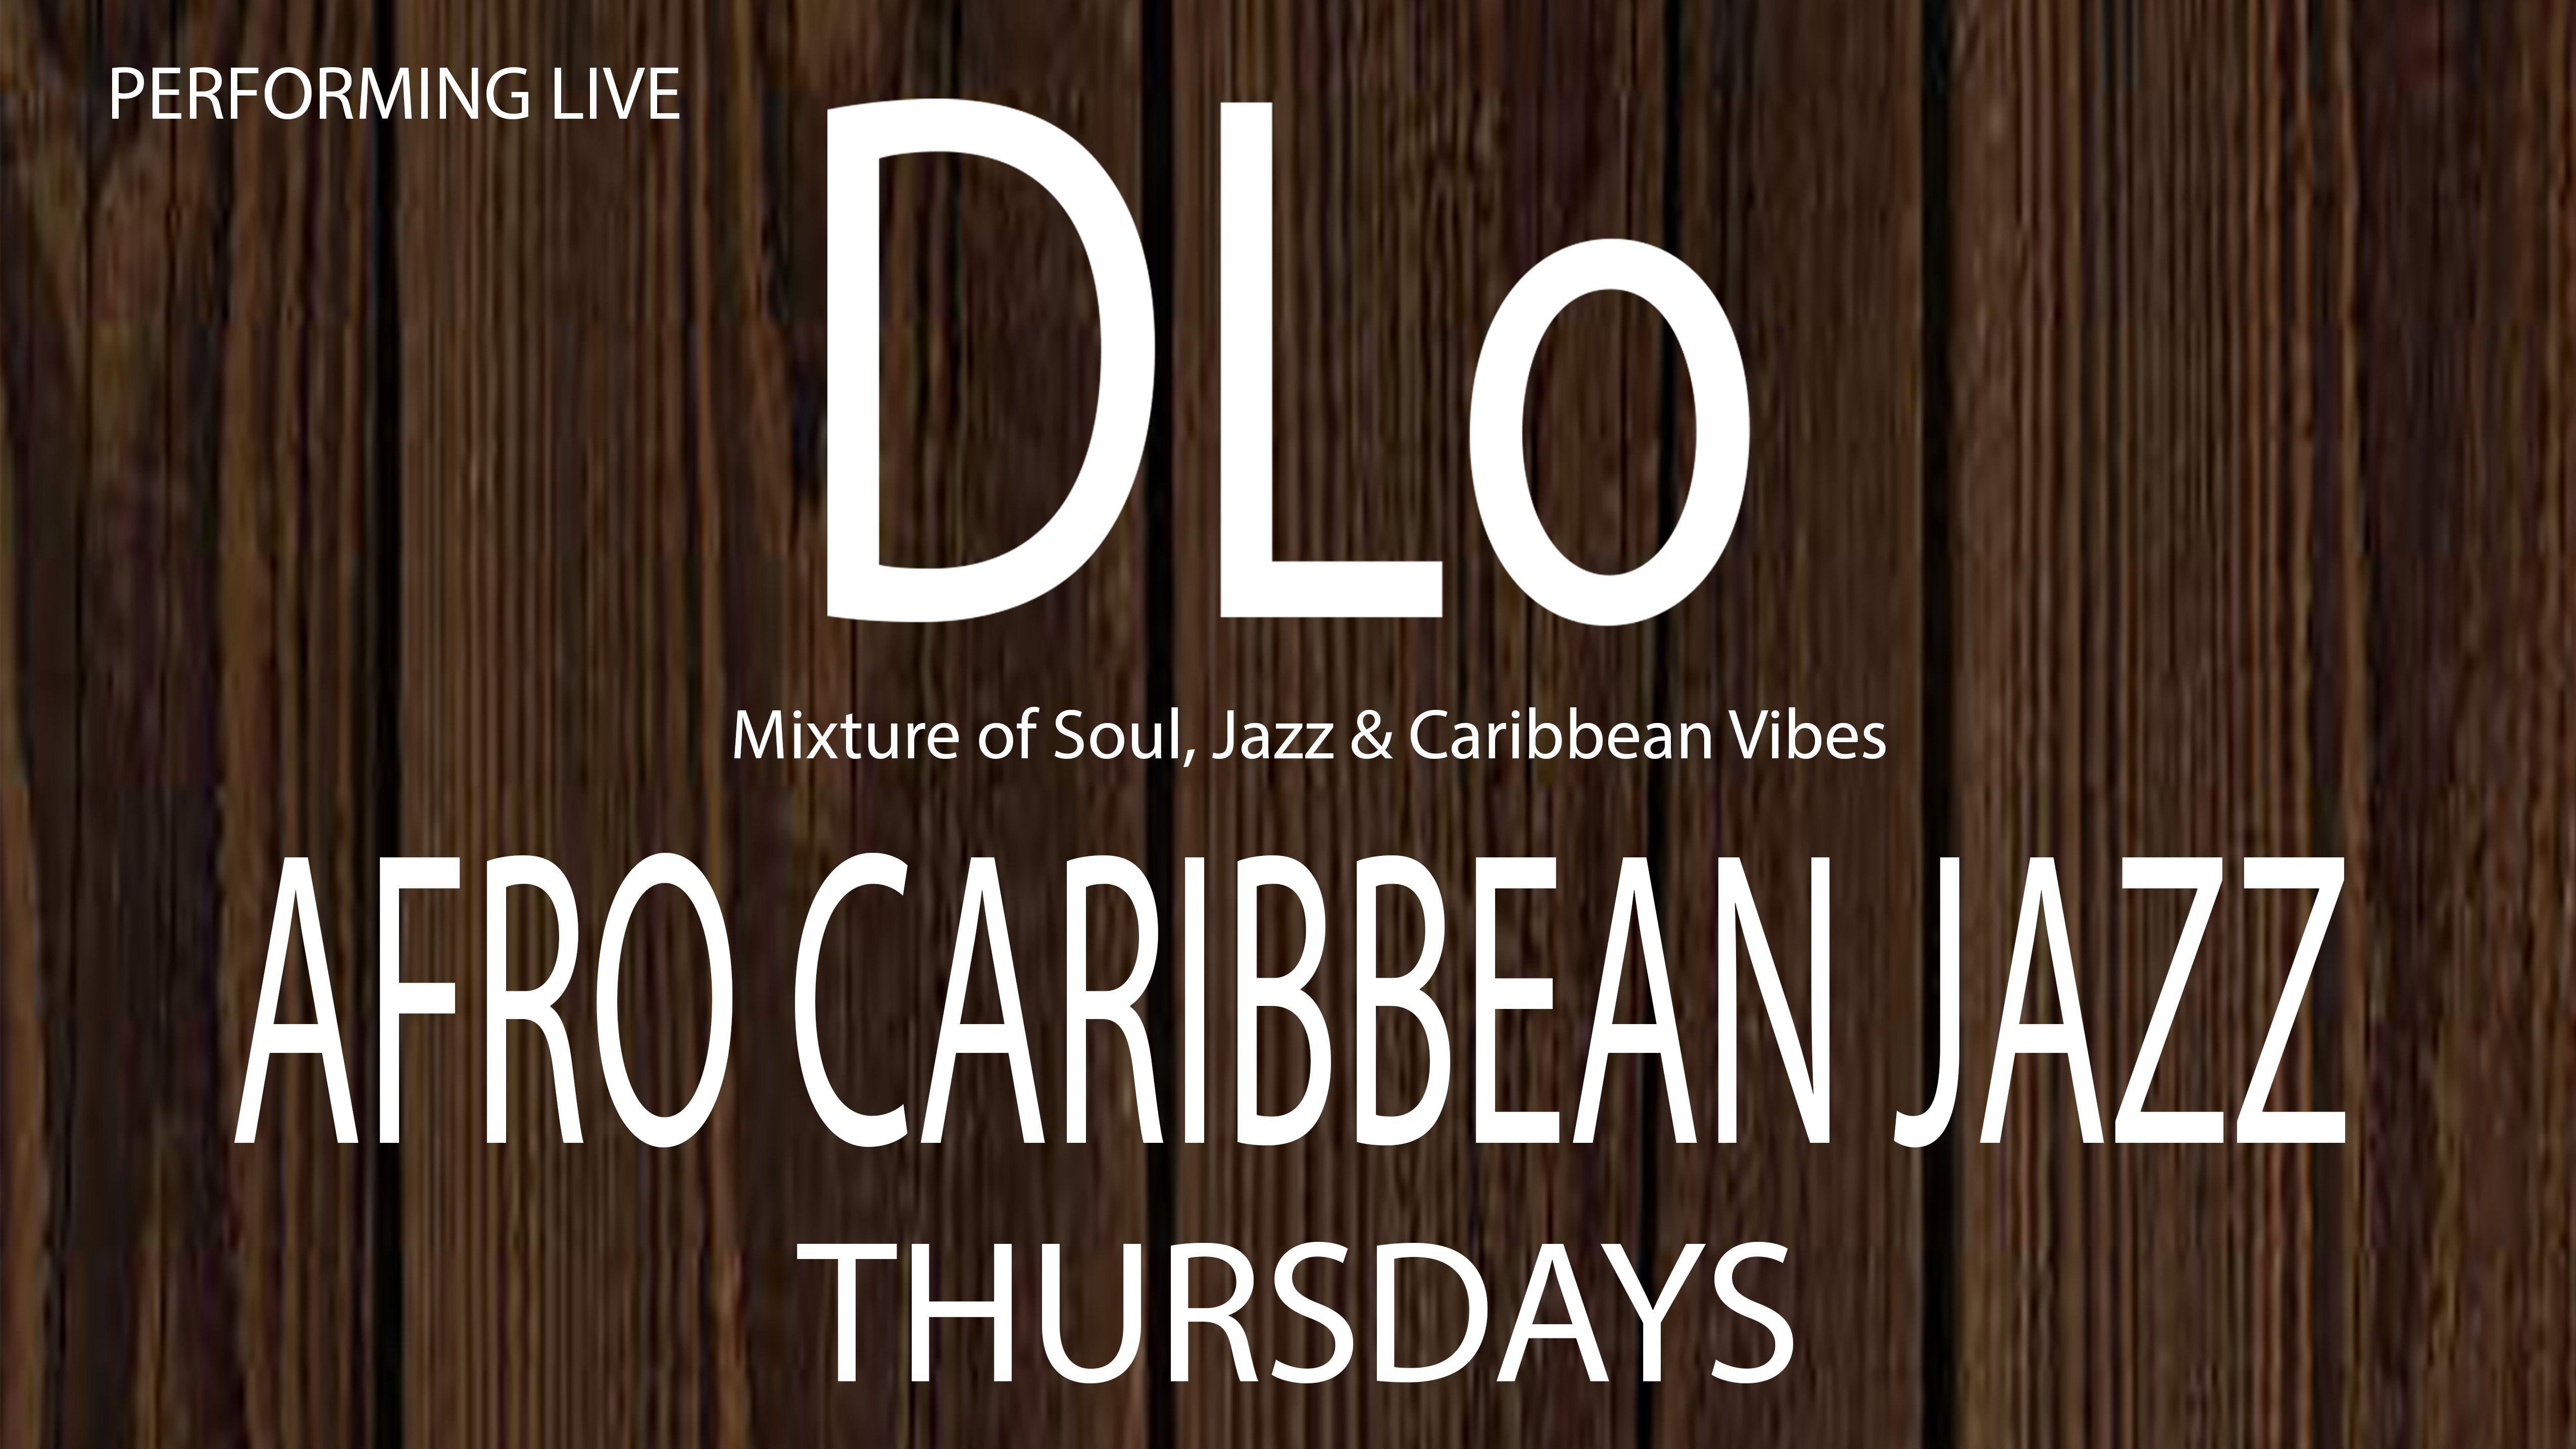 Afro Caribbean Jazz Thursdays @ Eve's Lounge